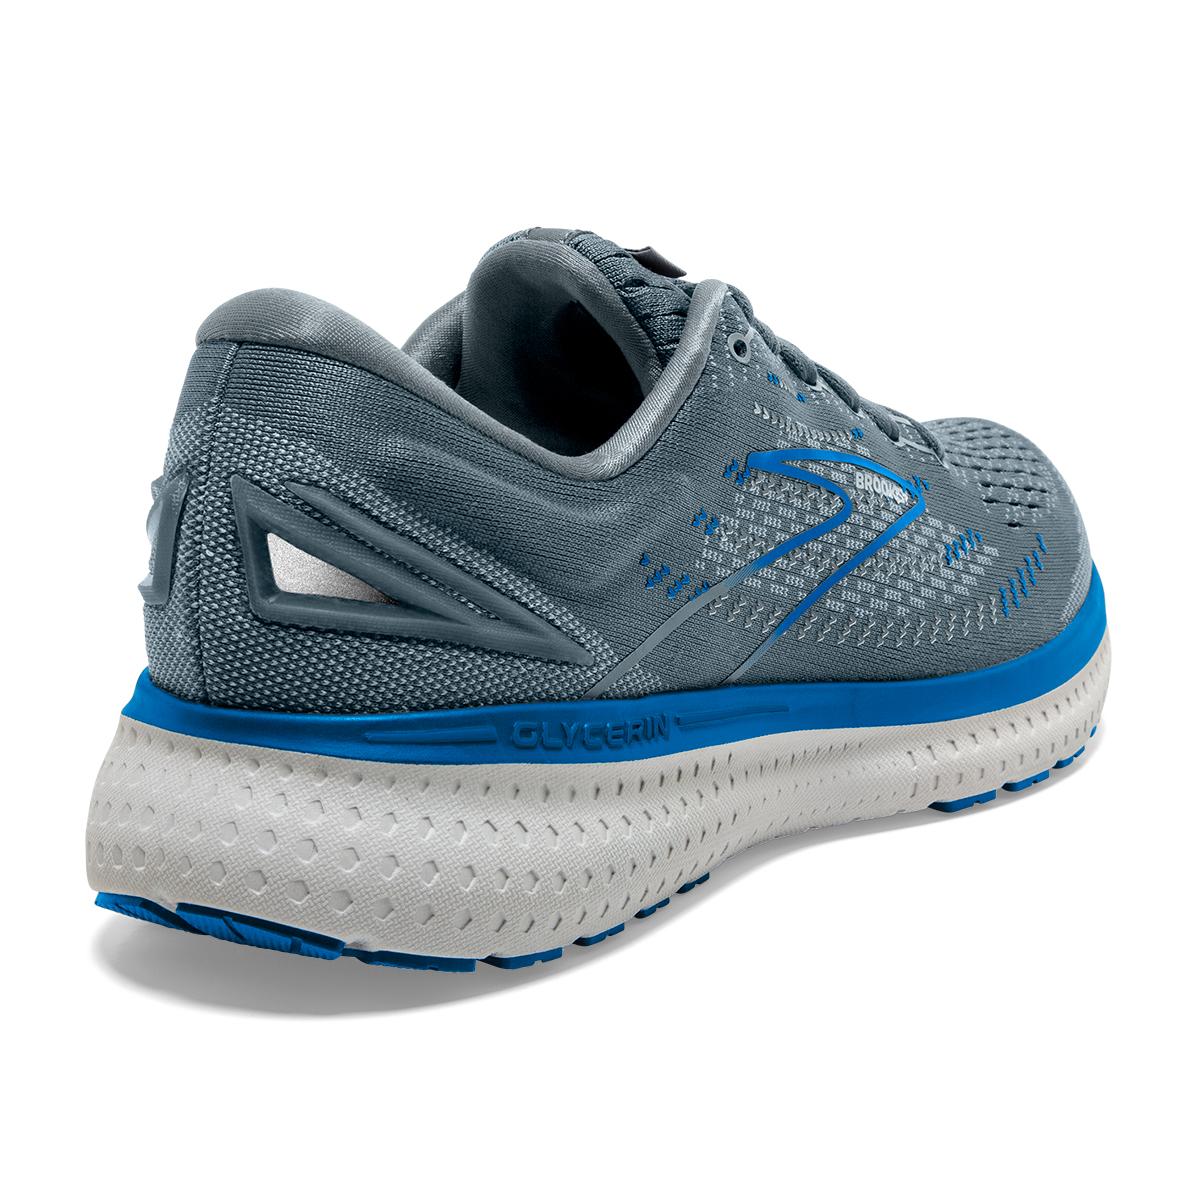 Men's Brooks Glycerin 19 Running Shoe - Color: Quarry/Grey/Dark - Size: 7 - Width: Regular, Quarry/Grey/Dark, large, image 6